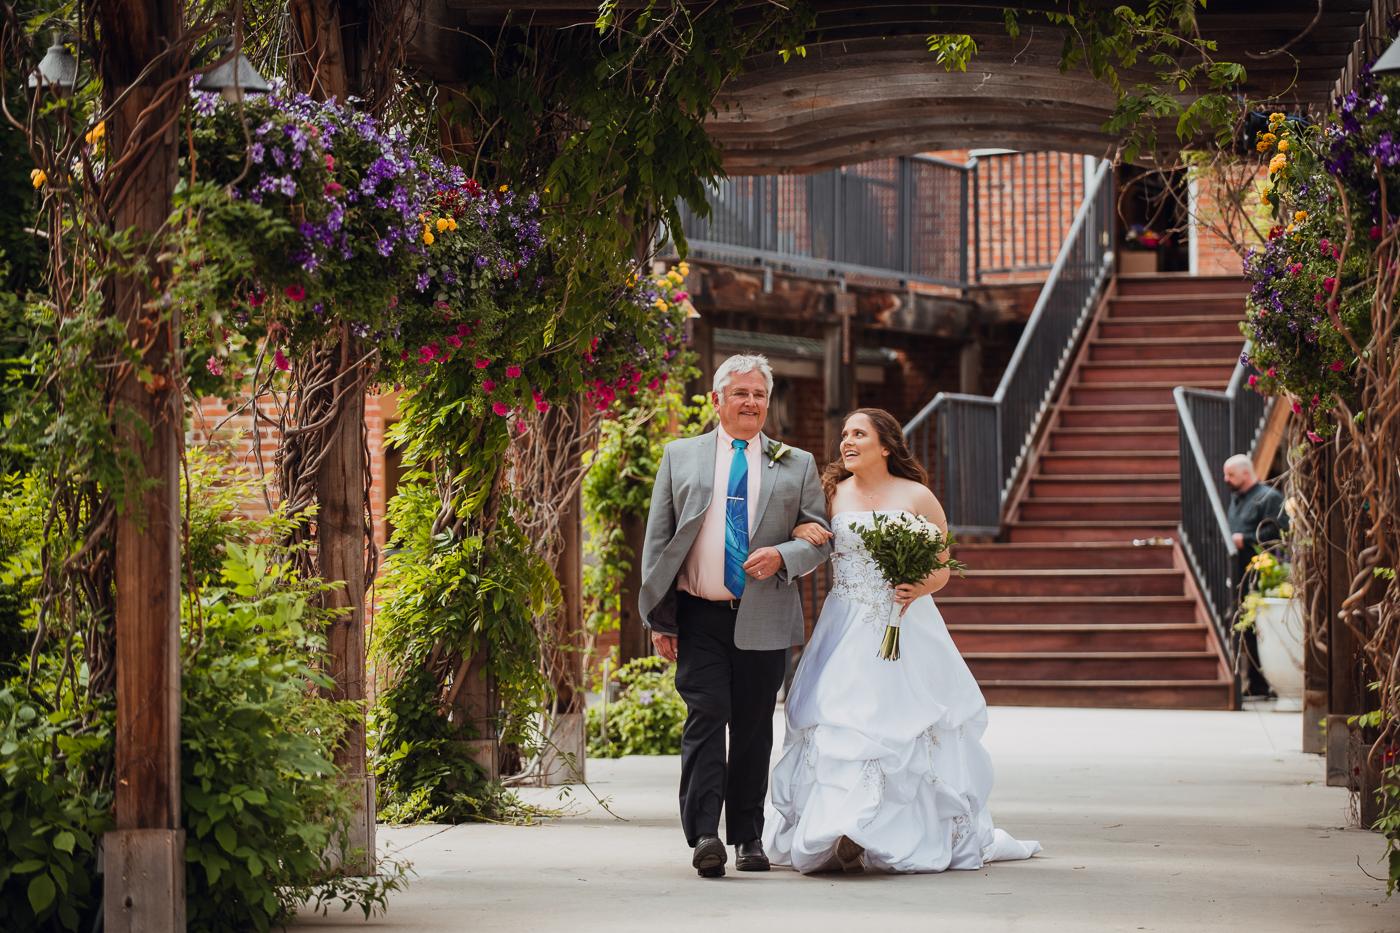 PHOCO Wedding Photography Brookside Gardens Berthoud Colorado Spring Julia Matt-9.jpg